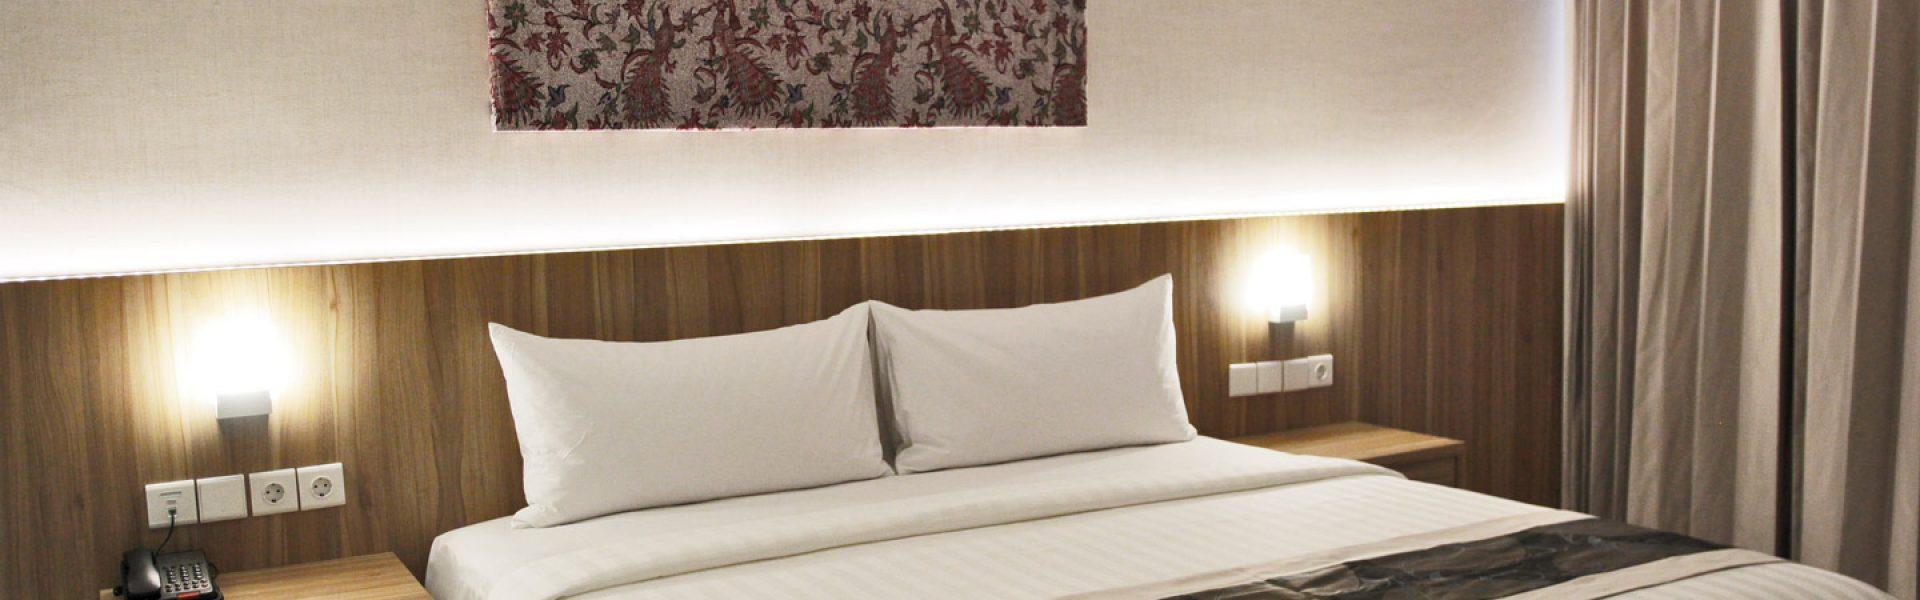 Capital Hotel Bali Deluxe Room 2